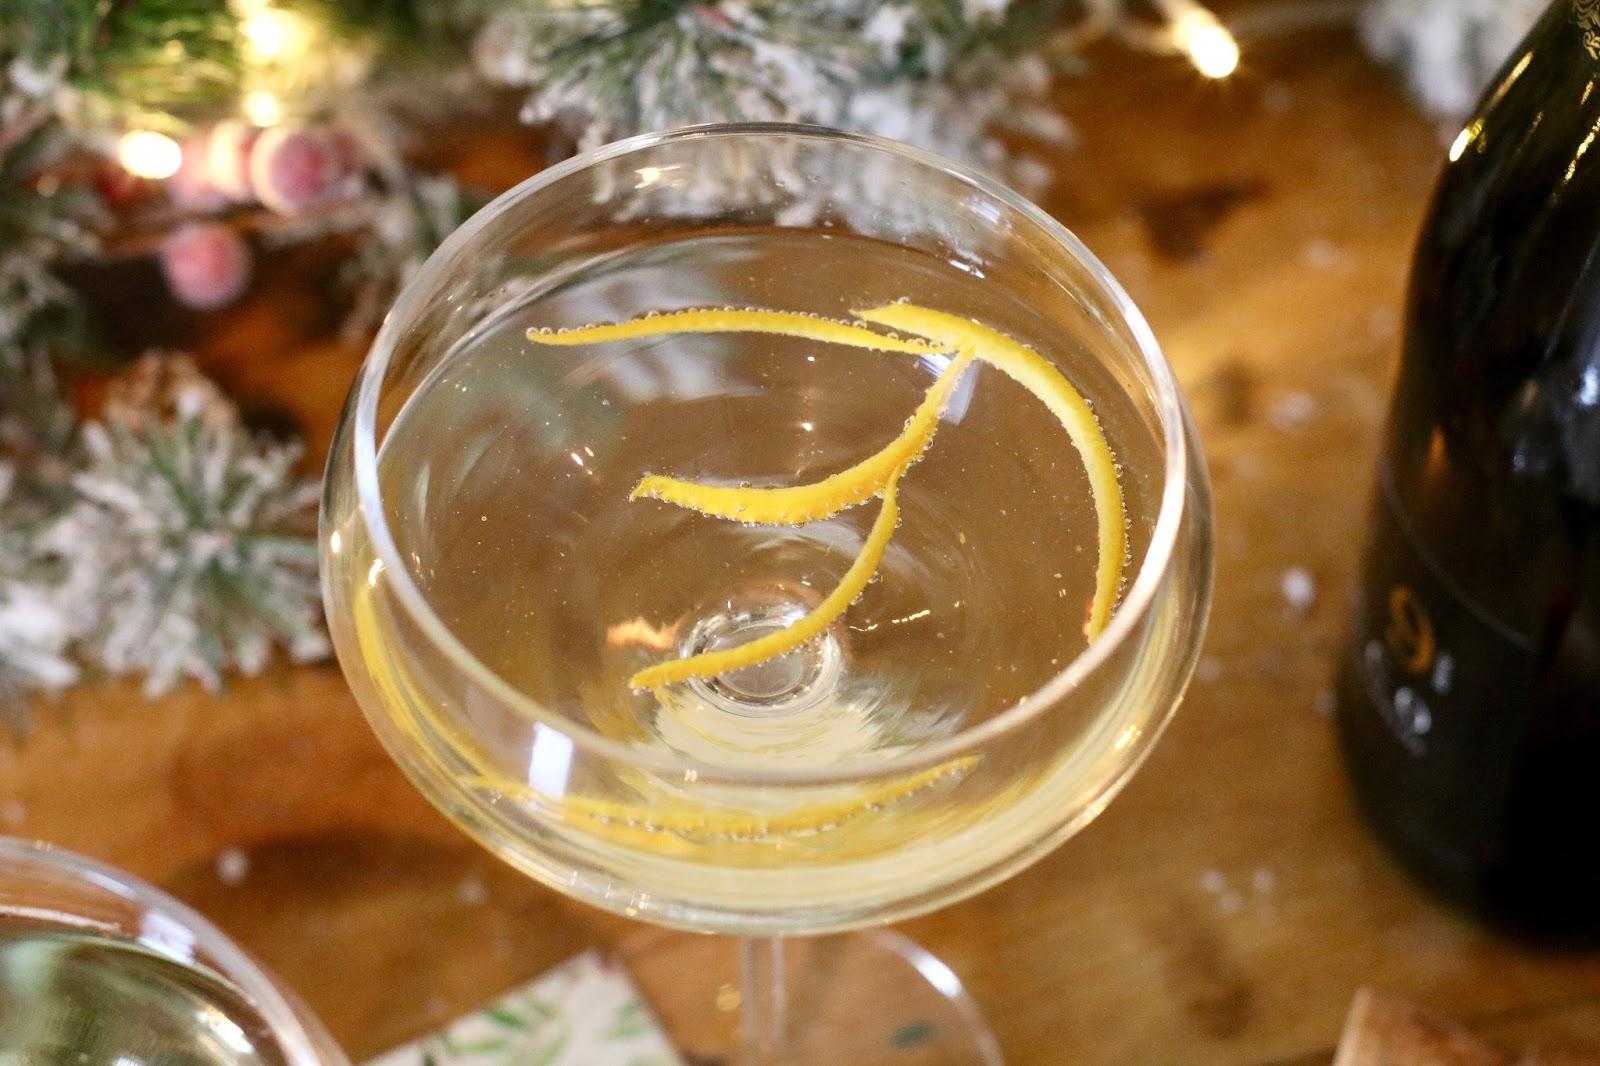 Festive-prosecco-Christmas-orange-peel